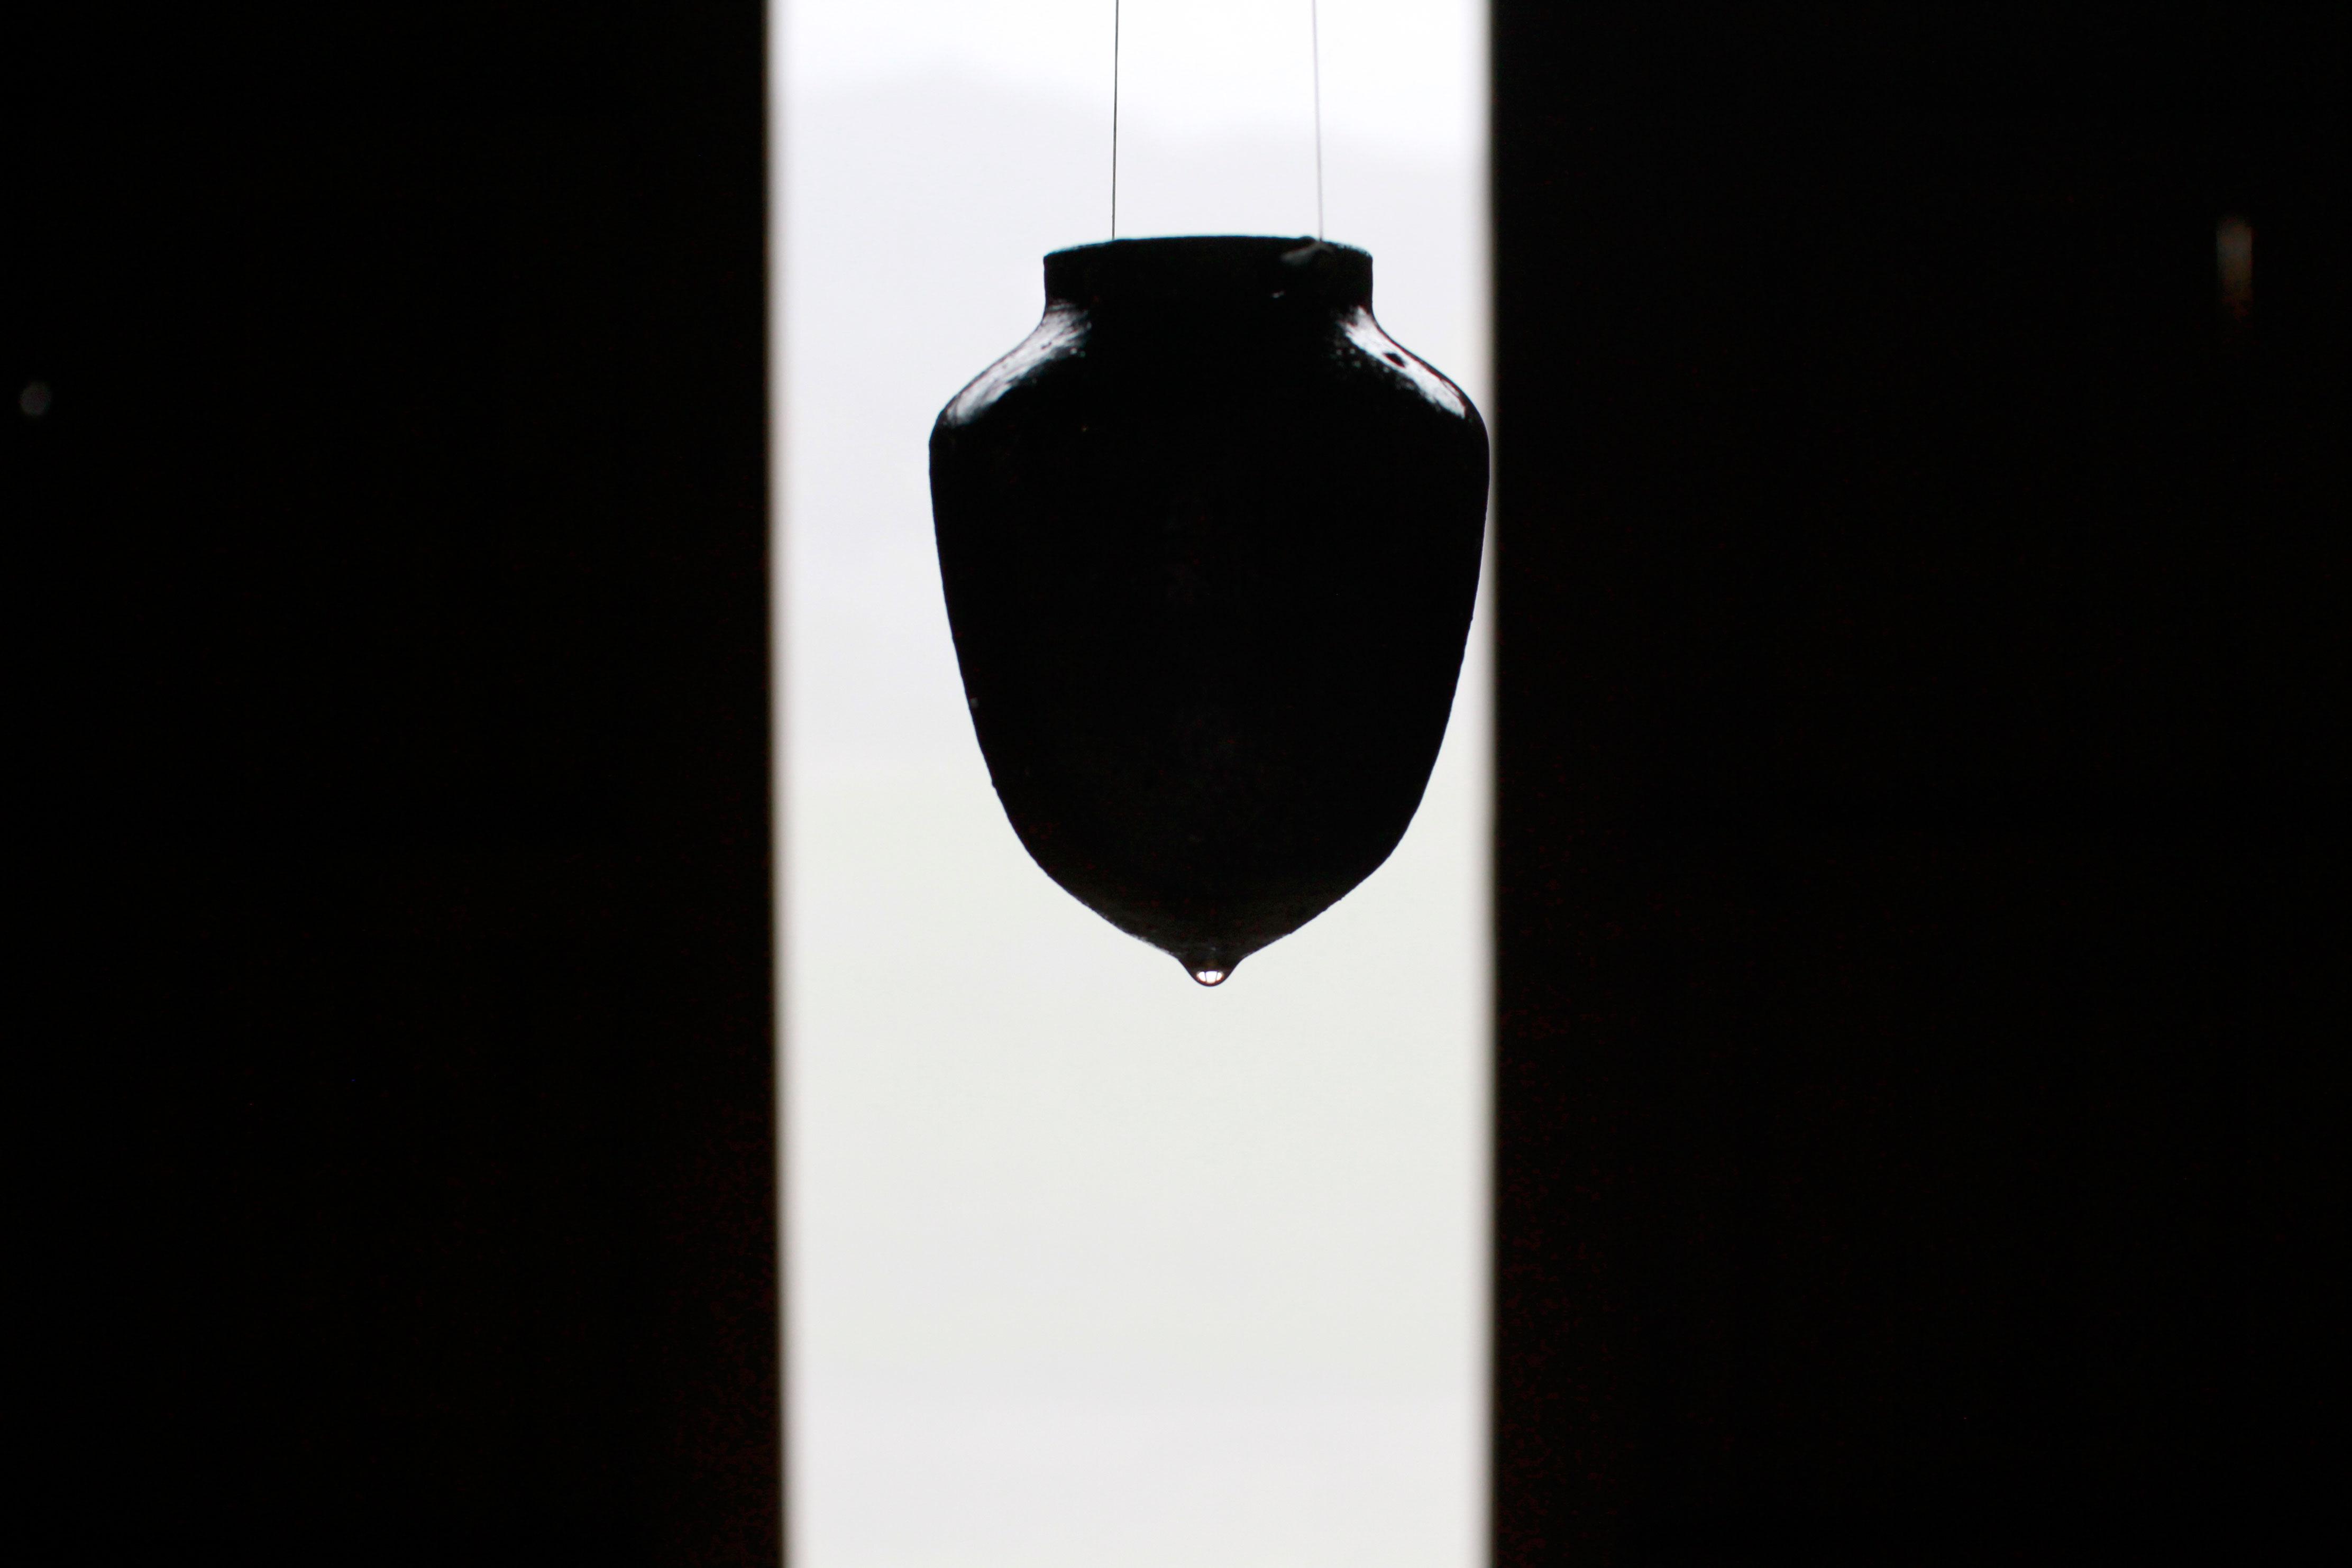 Japan Art Exhibition Shiro Oni Studio Art Residency シロオニスタジオの展覧会 2017 June Petra Dalstrom Artwork